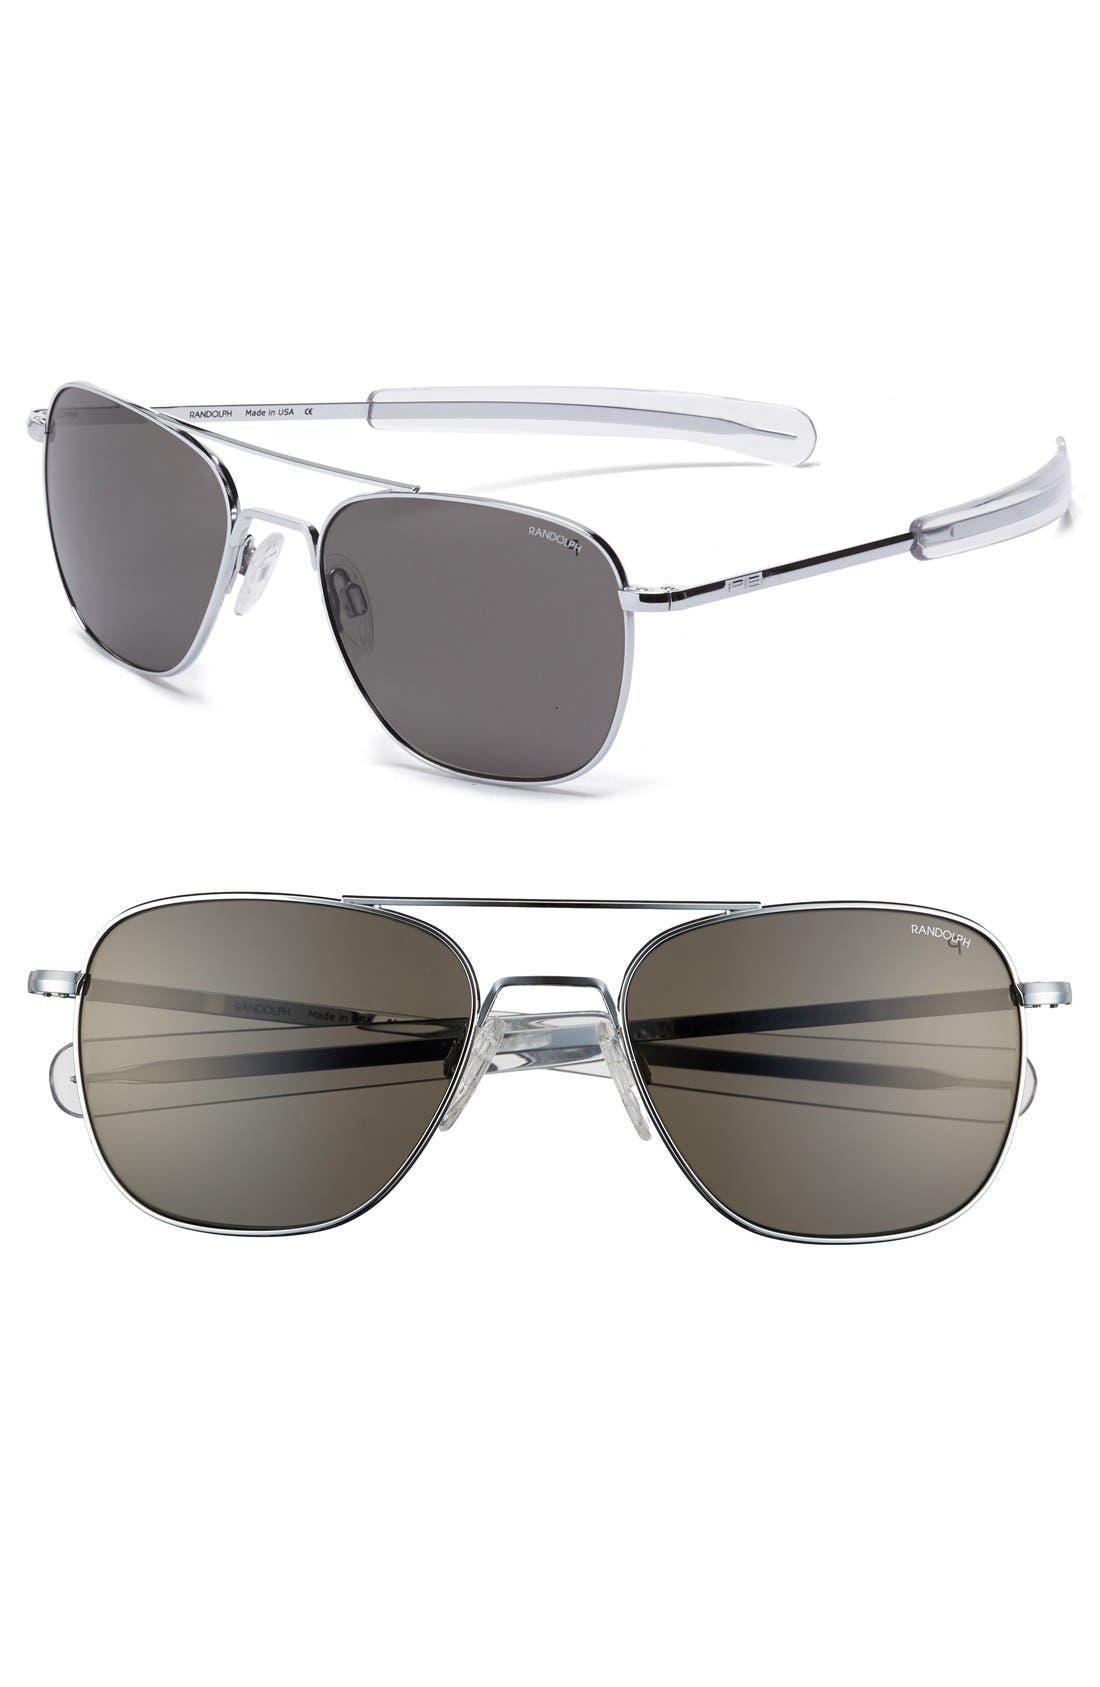 55mm Polarized Aviator Sunglasses,                             Main thumbnail 1, color,                             045